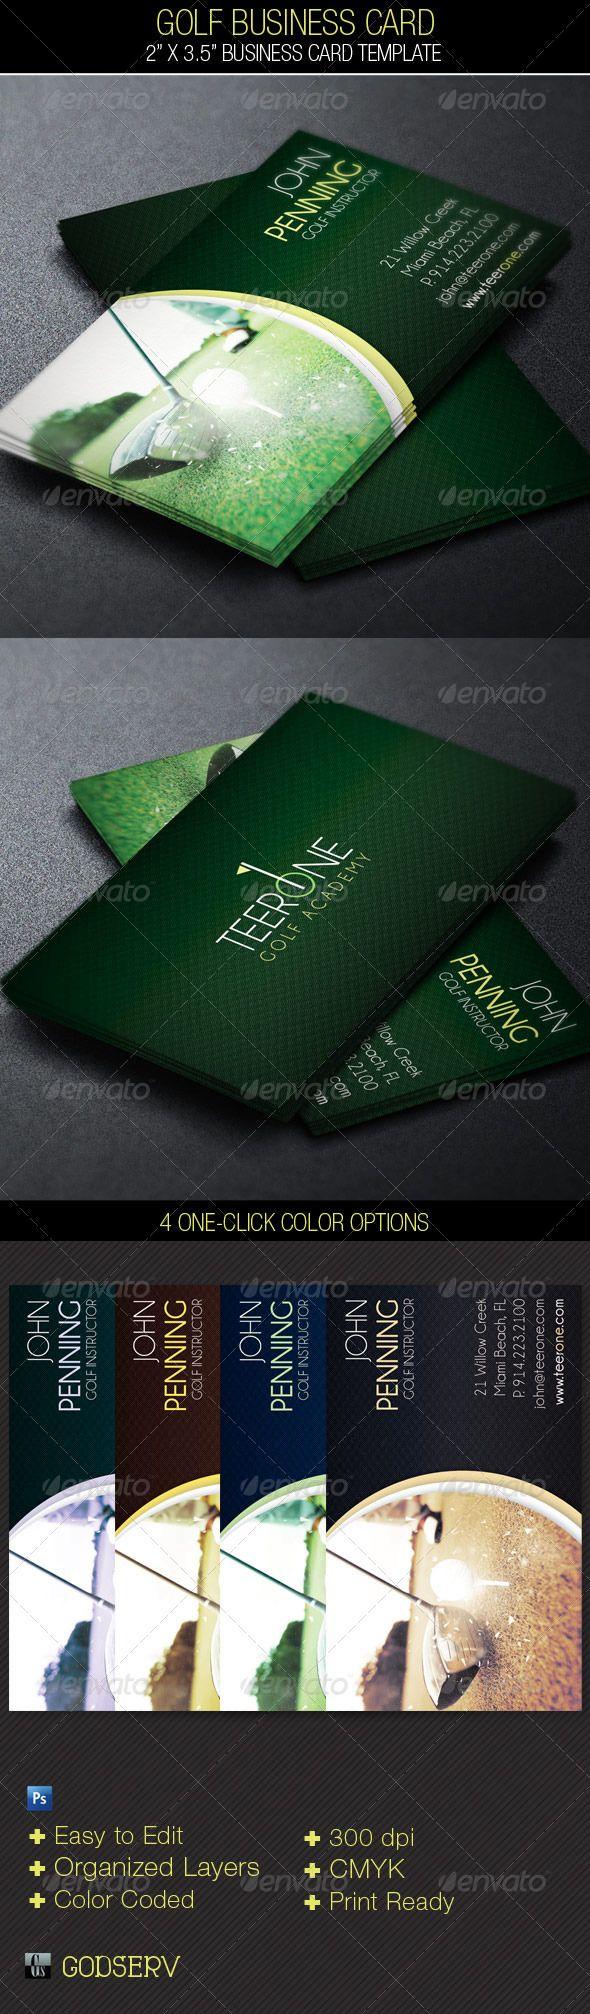 Golf business card template card templates business cards and golf golf business card template reheart Choice Image